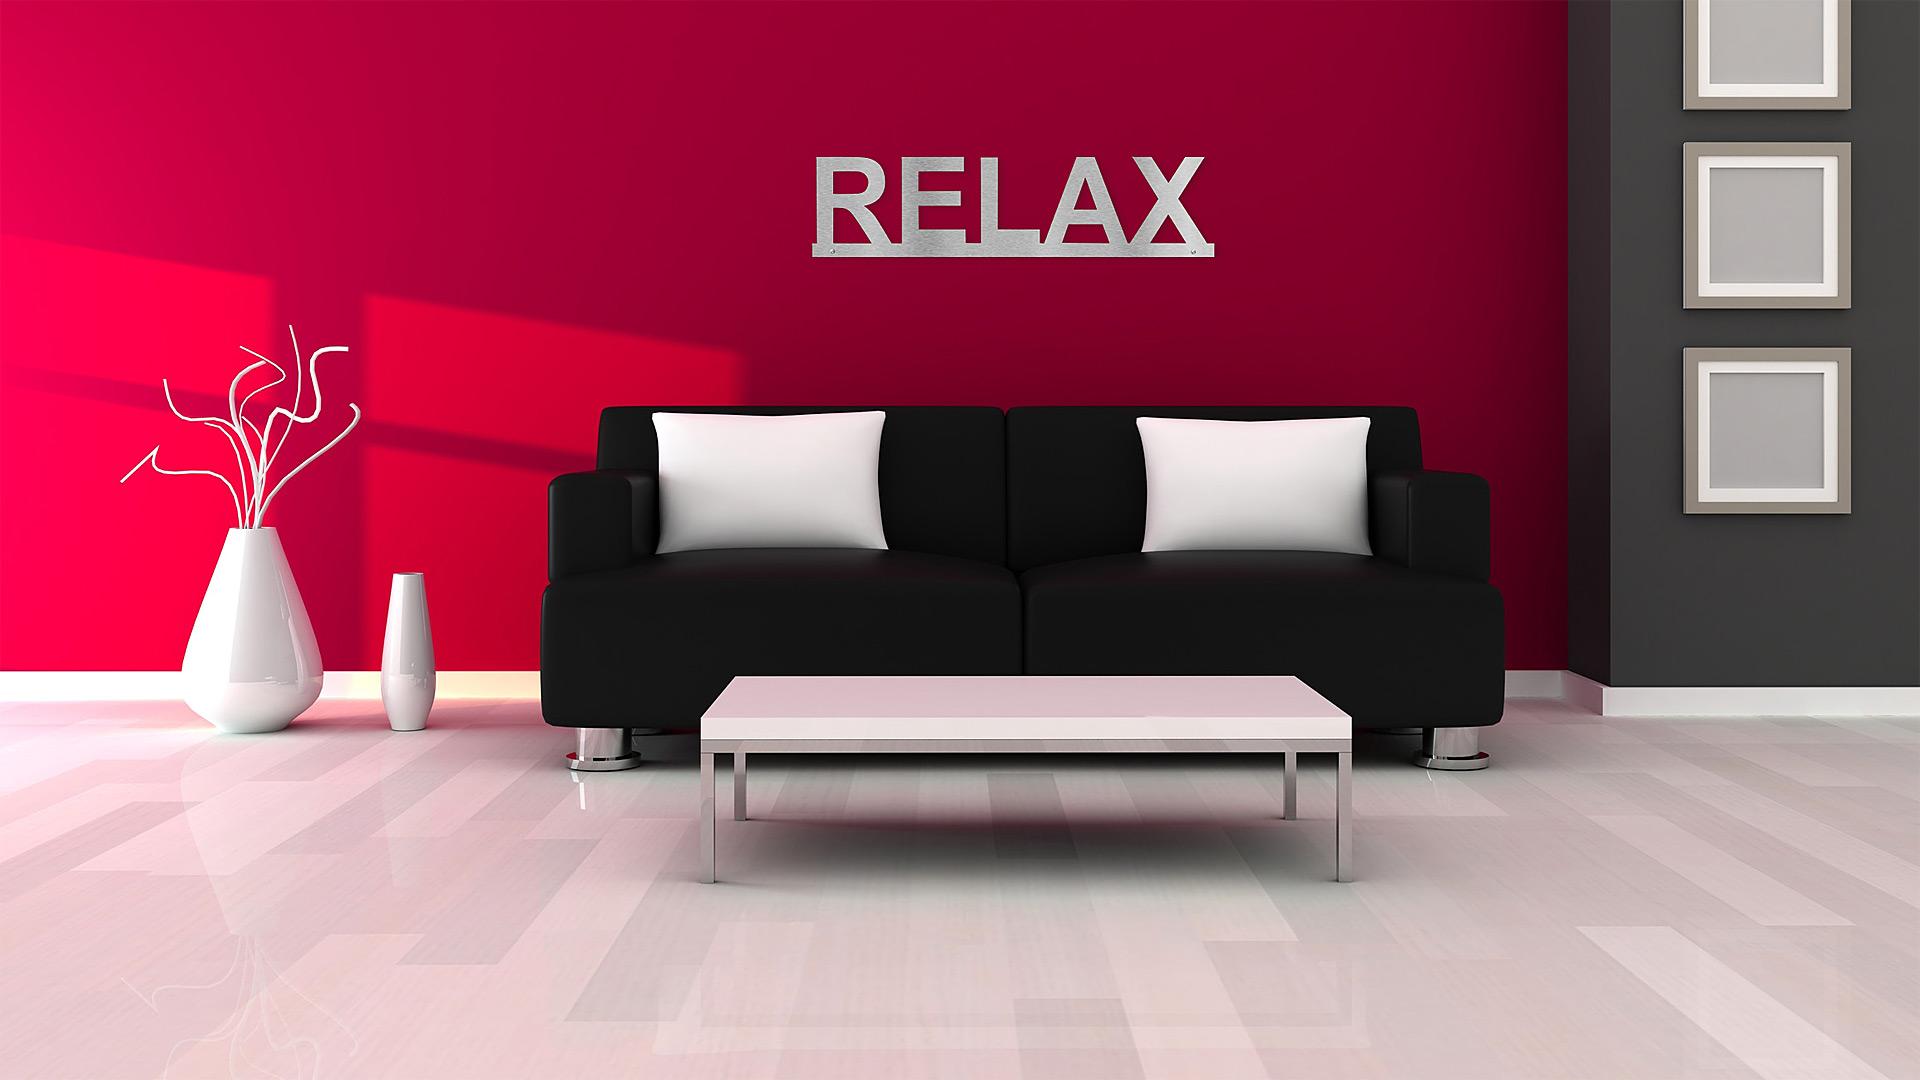 Relax wandtattoo aus edelstahl mit led ab 99 90 - Wandtattoo relax ...